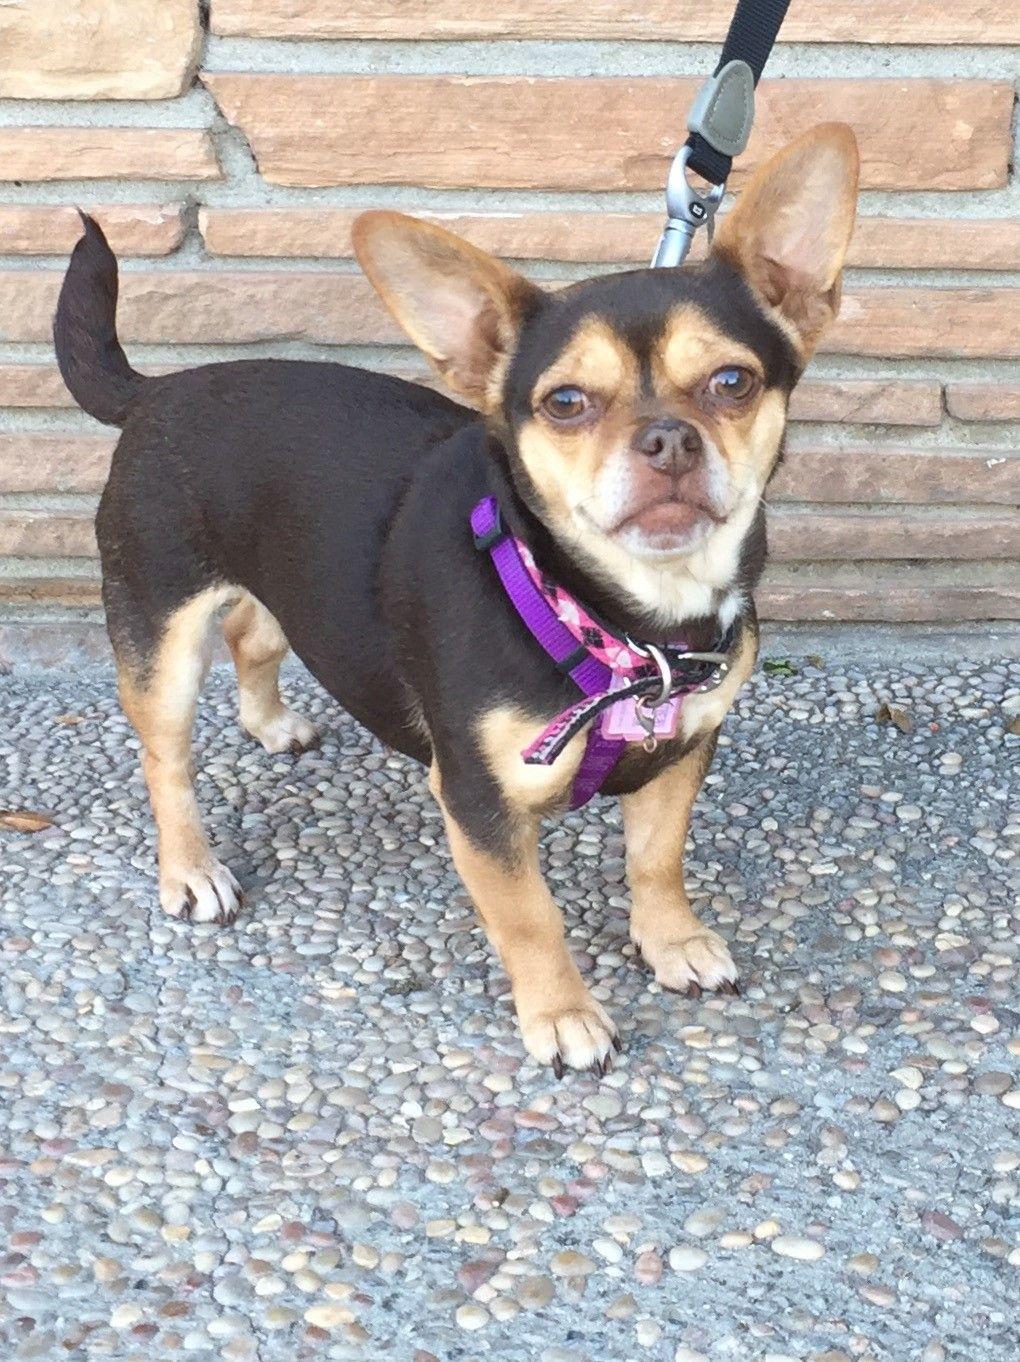 French Bullhuahua dog for Adoption in Santa Cruz, CA. ADN